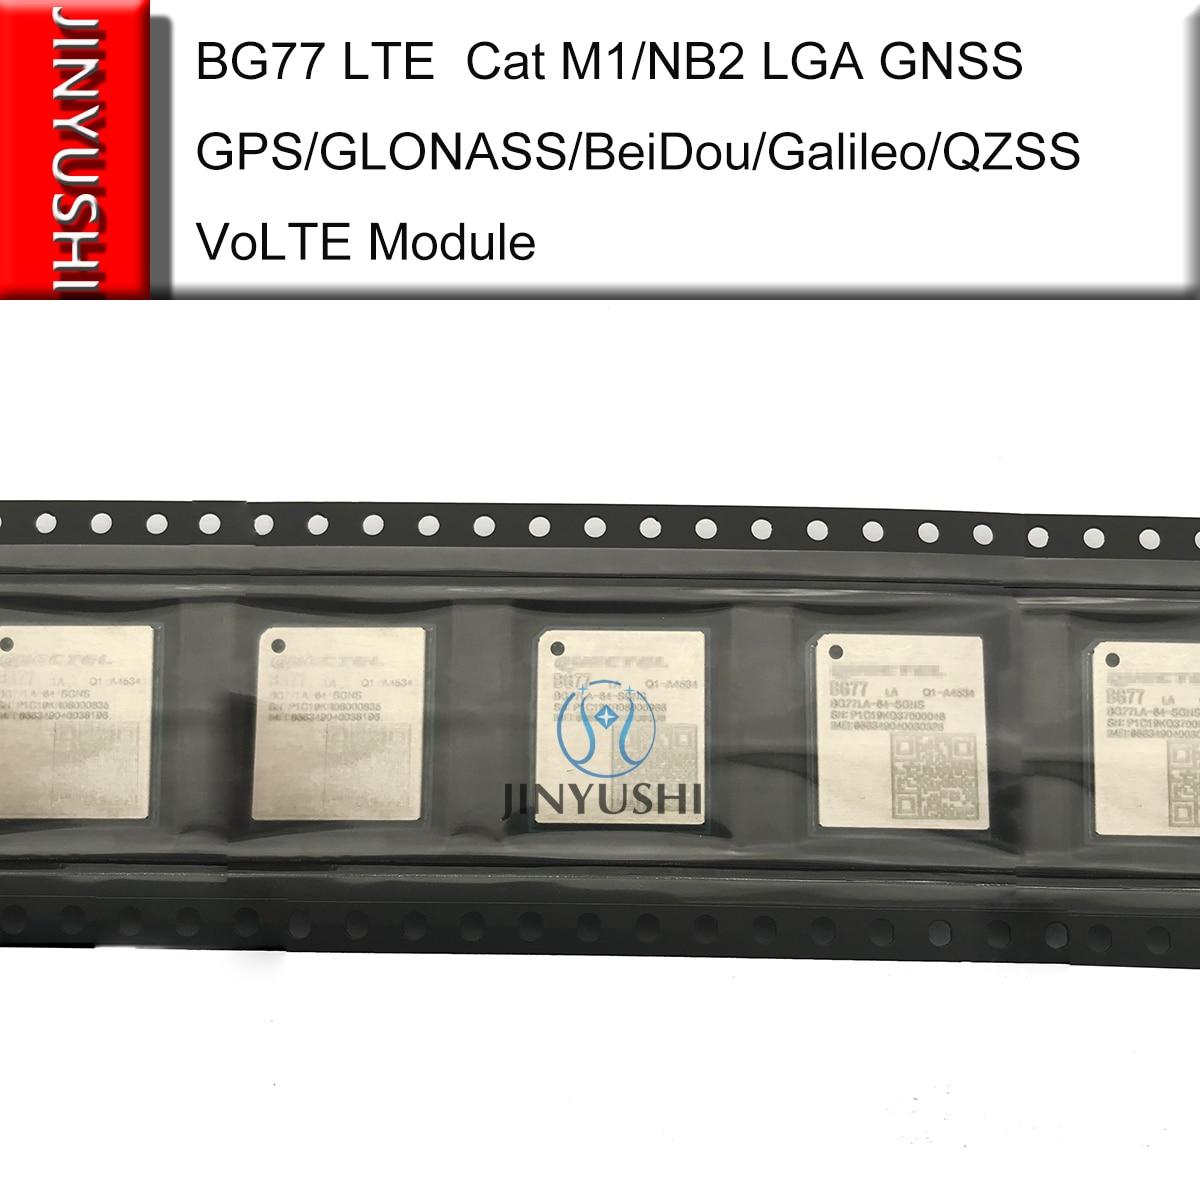 JINYUSHI BG77 LTE  Cat M1/NB2 LGA GNSS GPS/GLONASS/BeiDou/Galileo/QZSS VoLTE Module